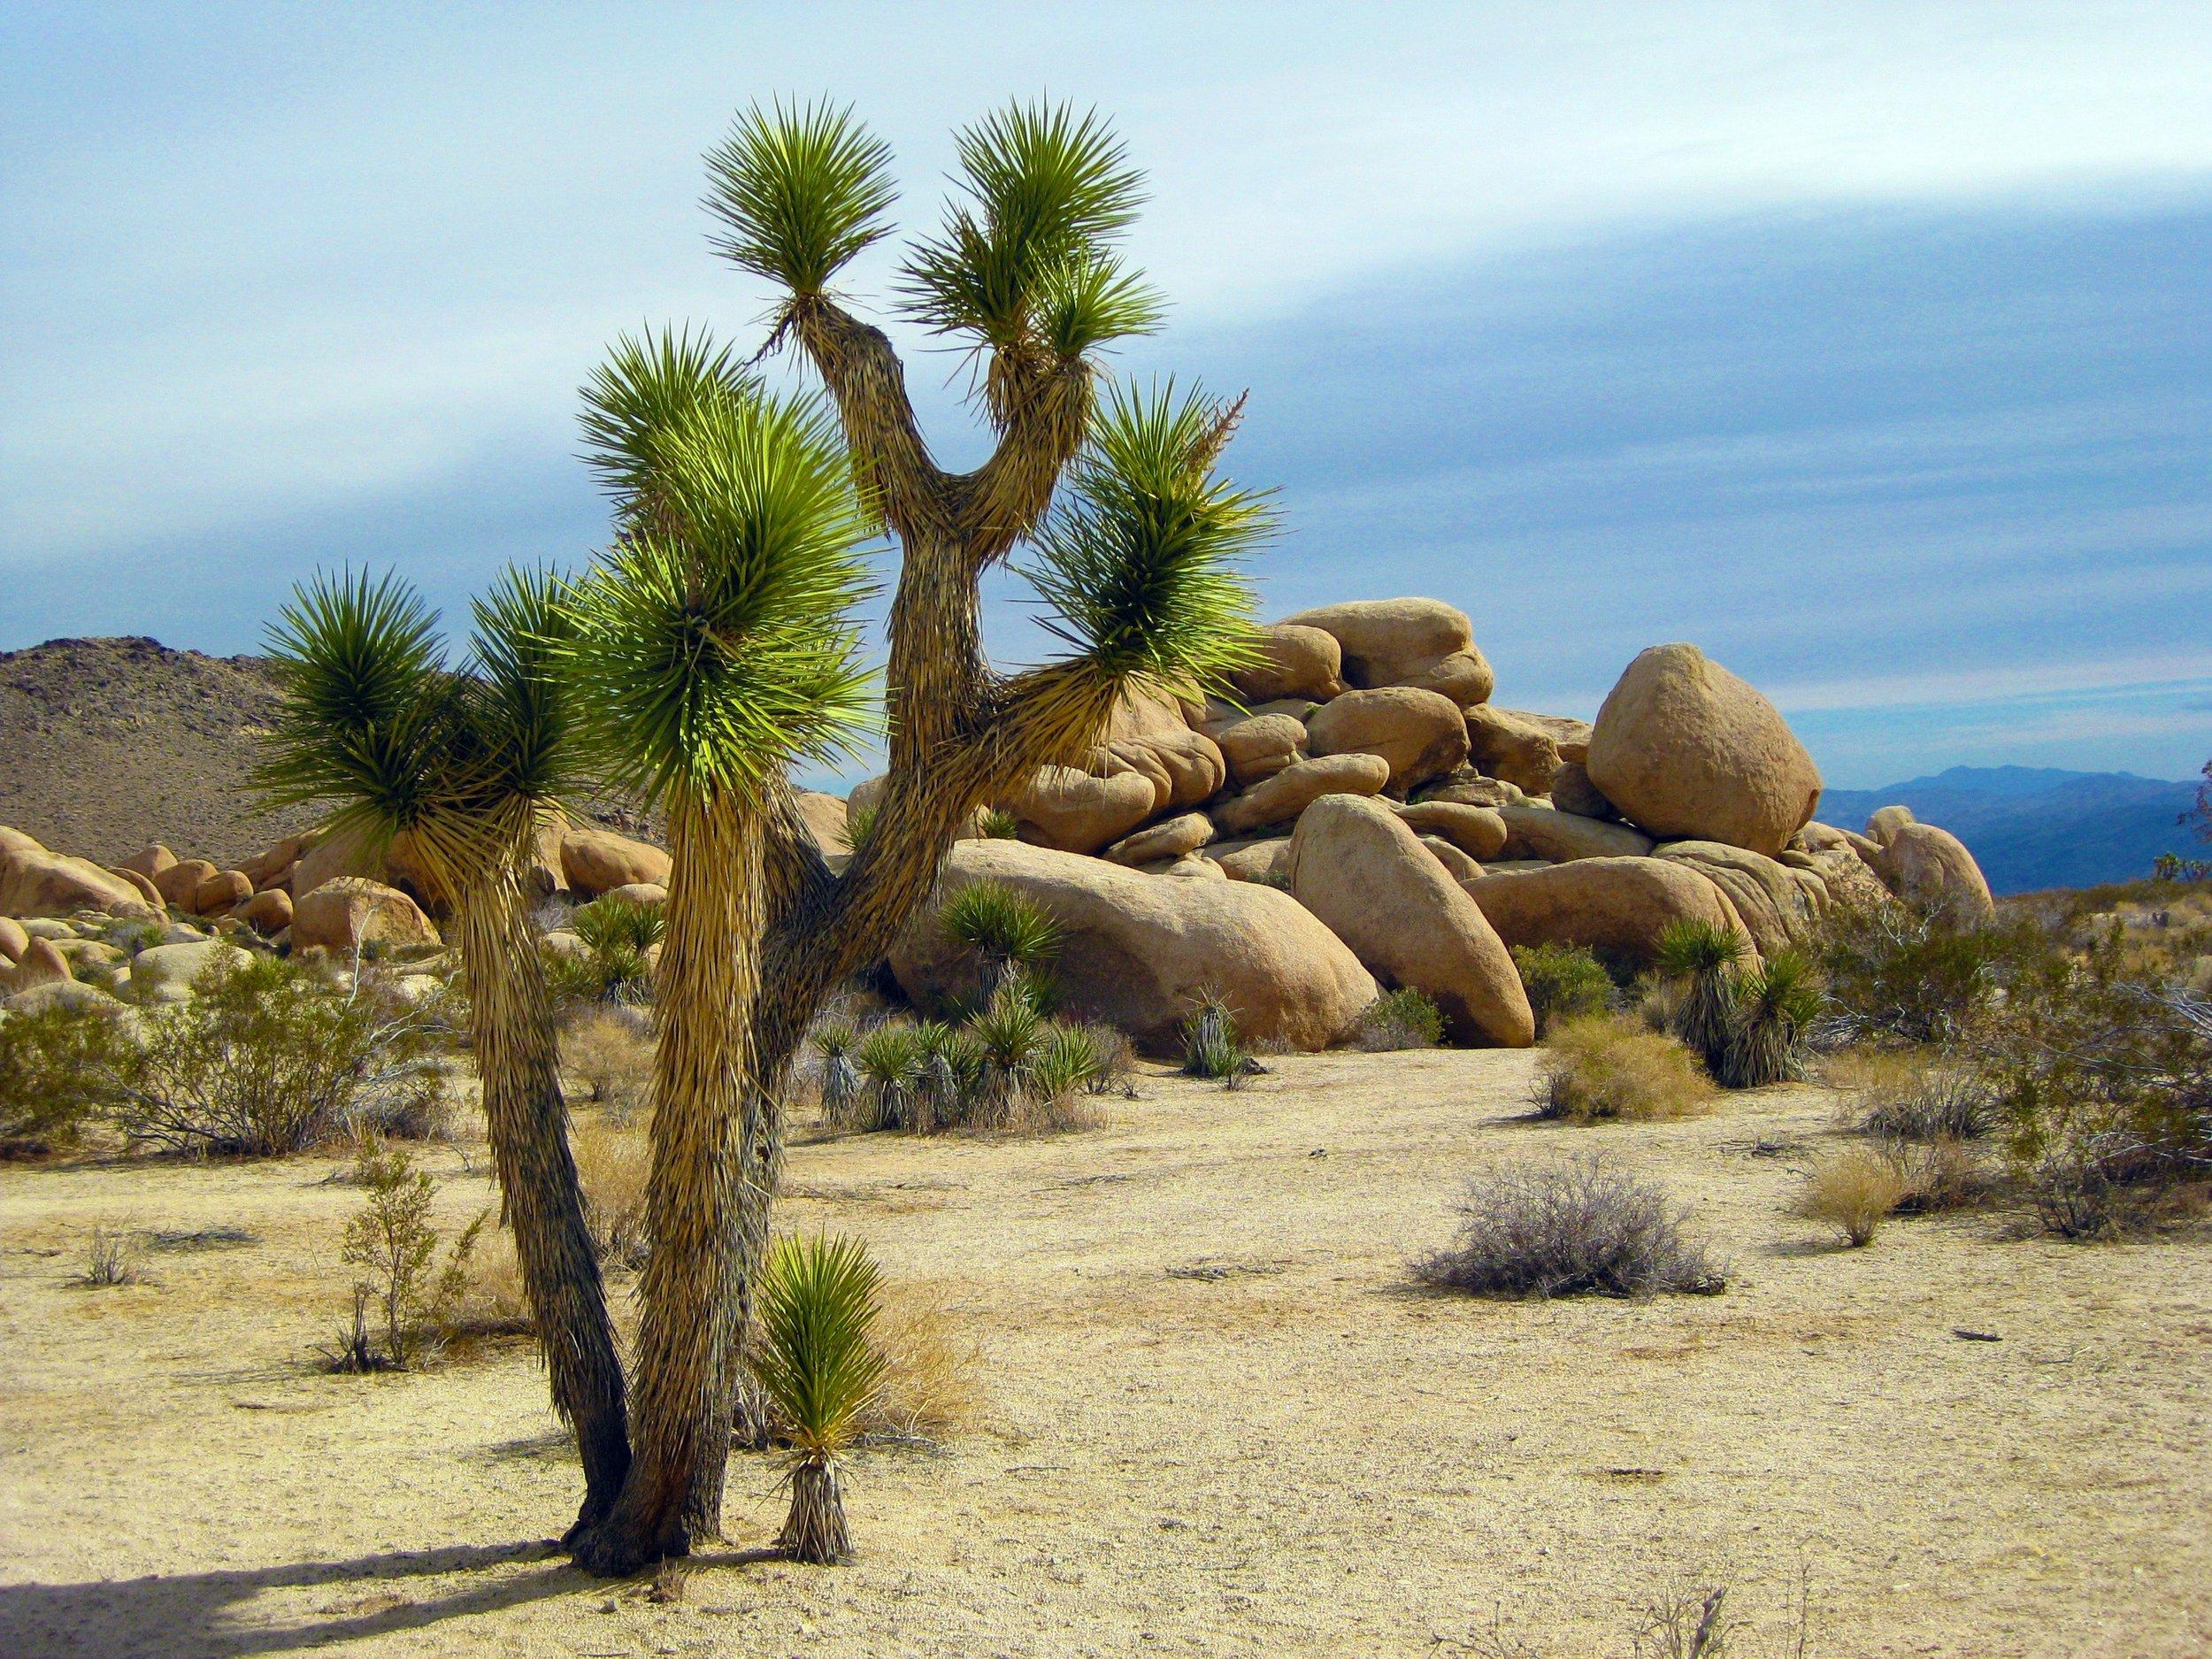 america-arid-bushes-221148